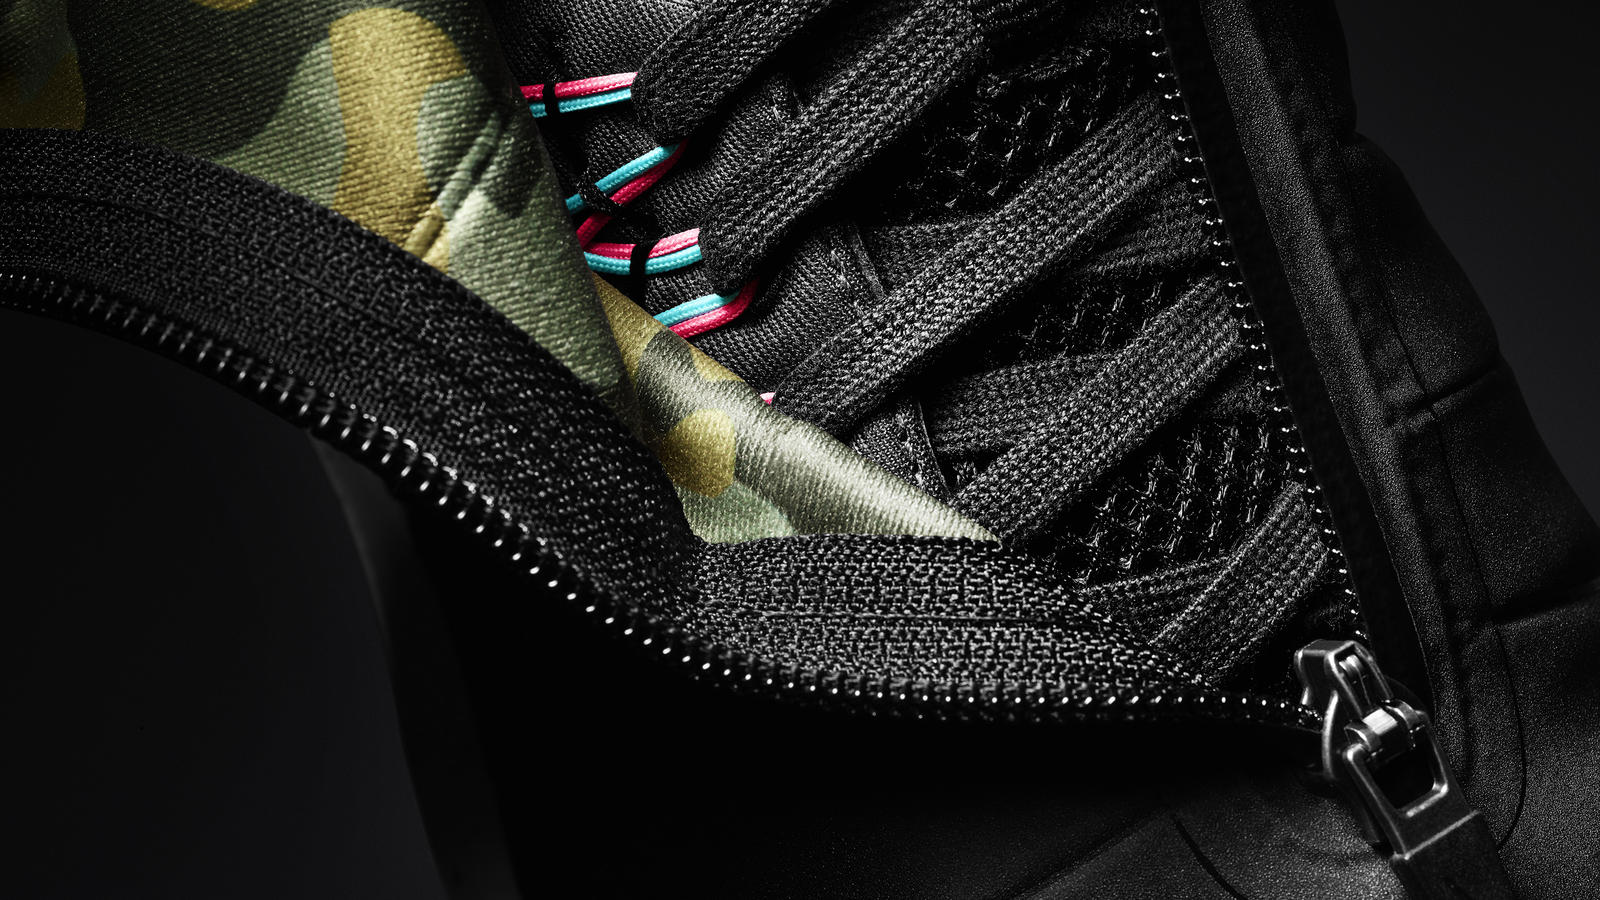 new product 7c3c9 cbda0 Nike Lunar Bandon3 inside